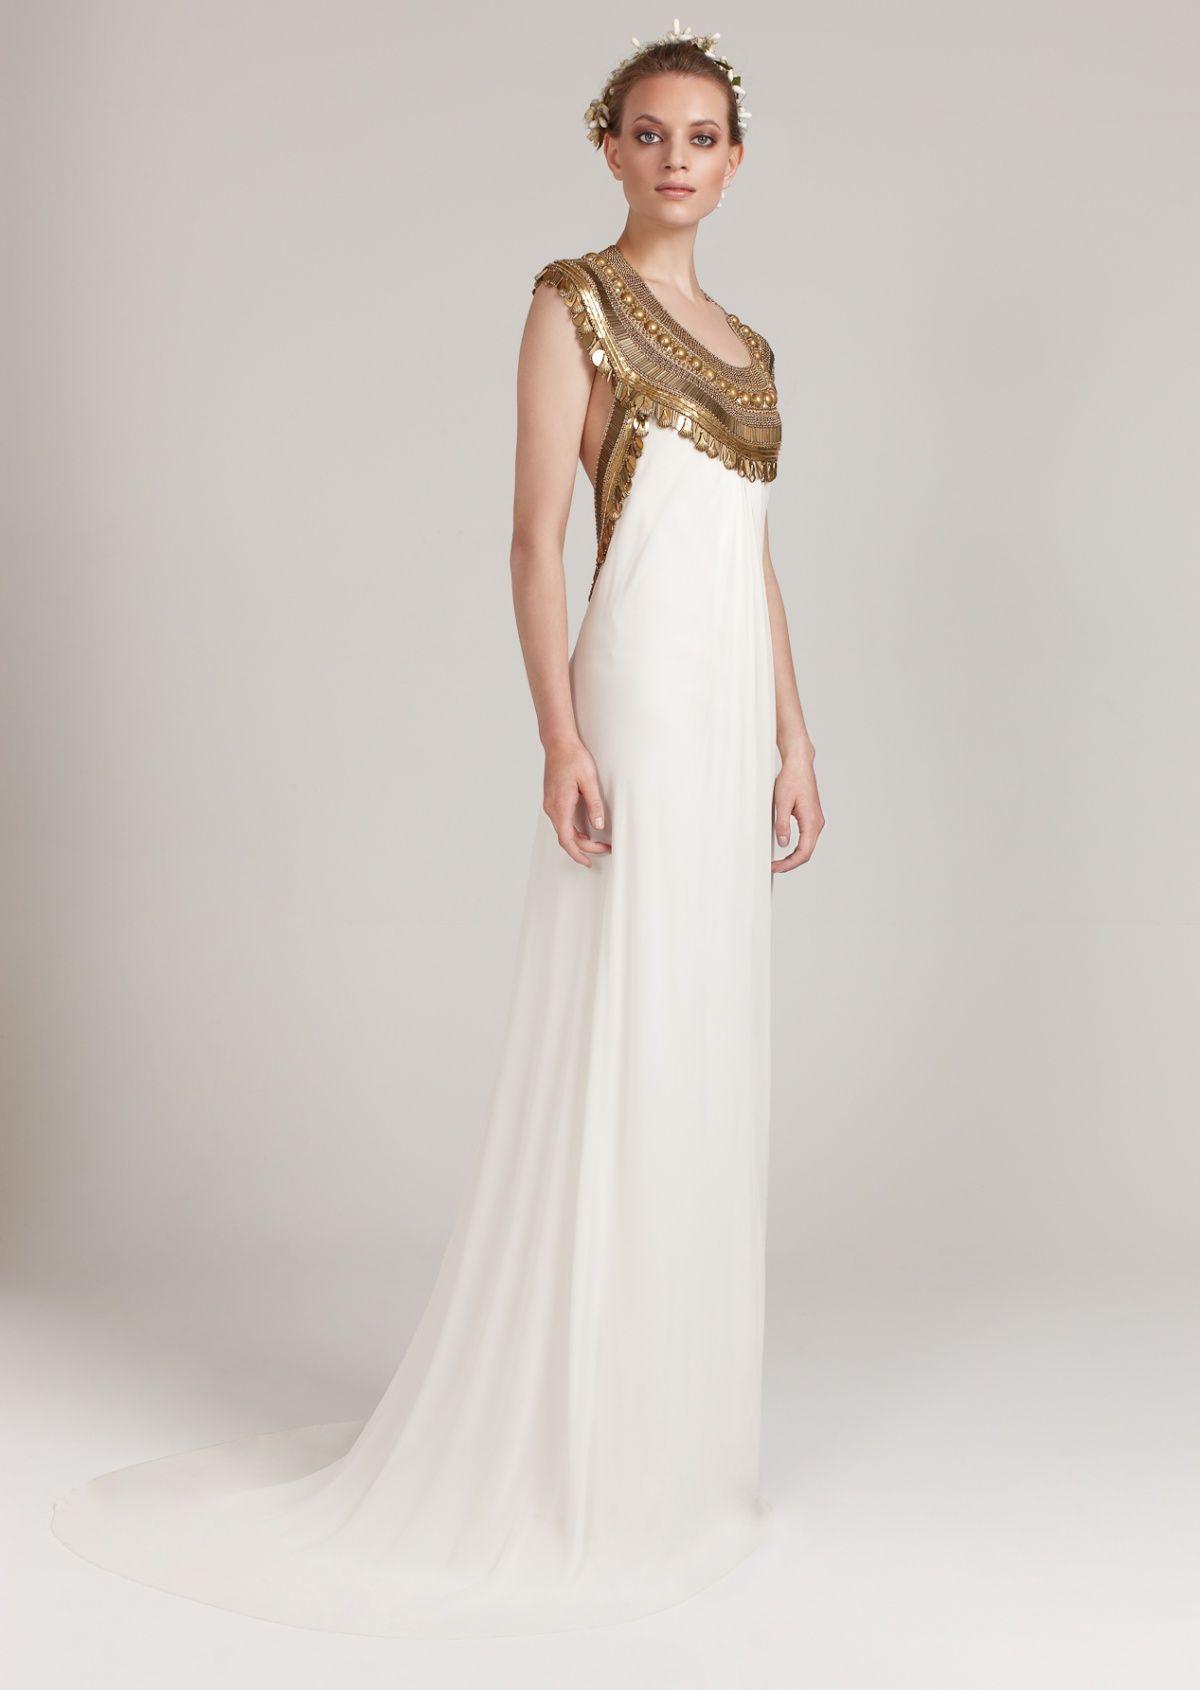 9cba679e7ff5 Art Deco 30's | Vintage Inspired Wedding Gowns | Temperley wedding ...